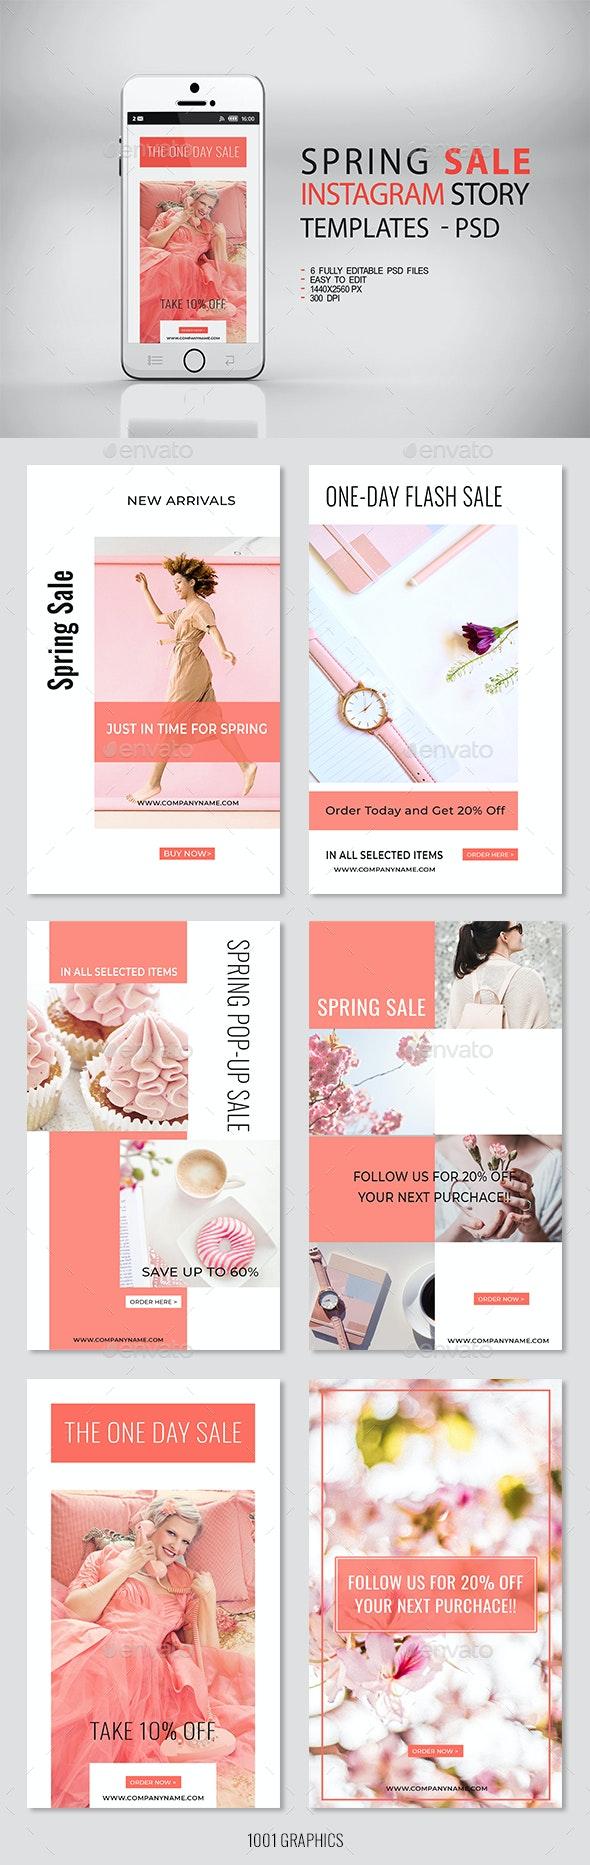 6 Spring Sale Insta-Story Templates PSD - Social Media Web Elements